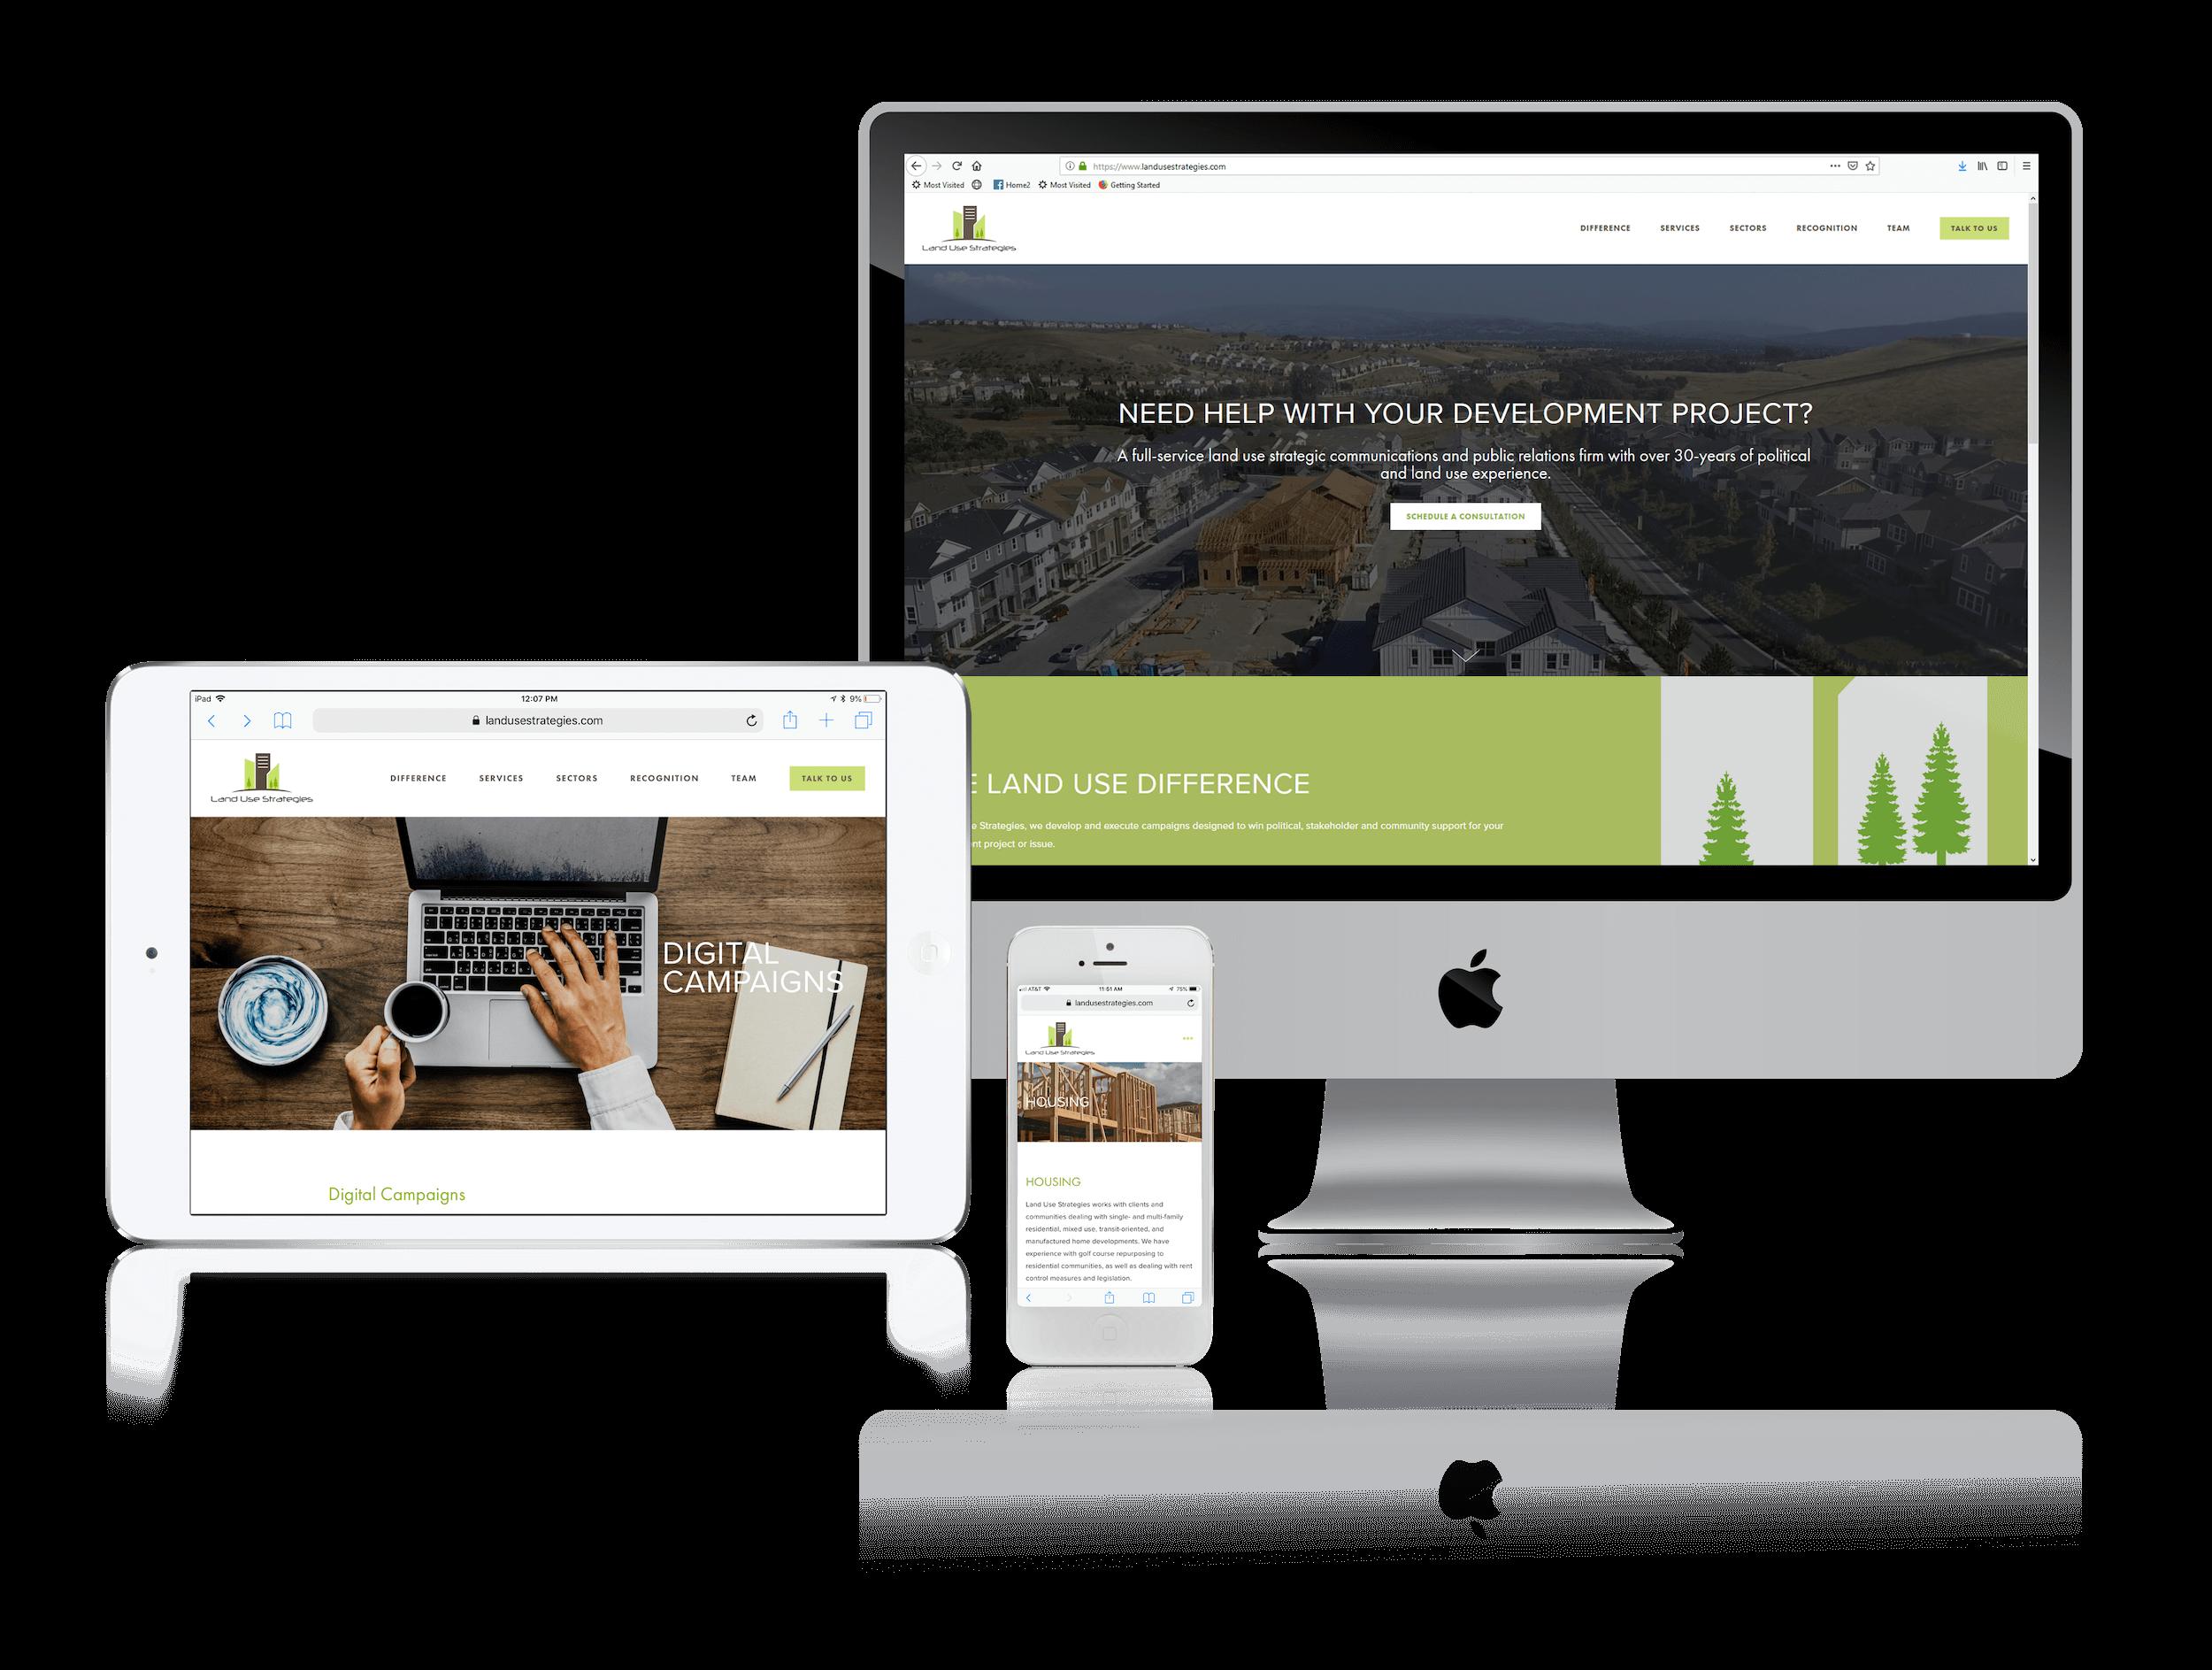 Squarespace for Development Project Websites